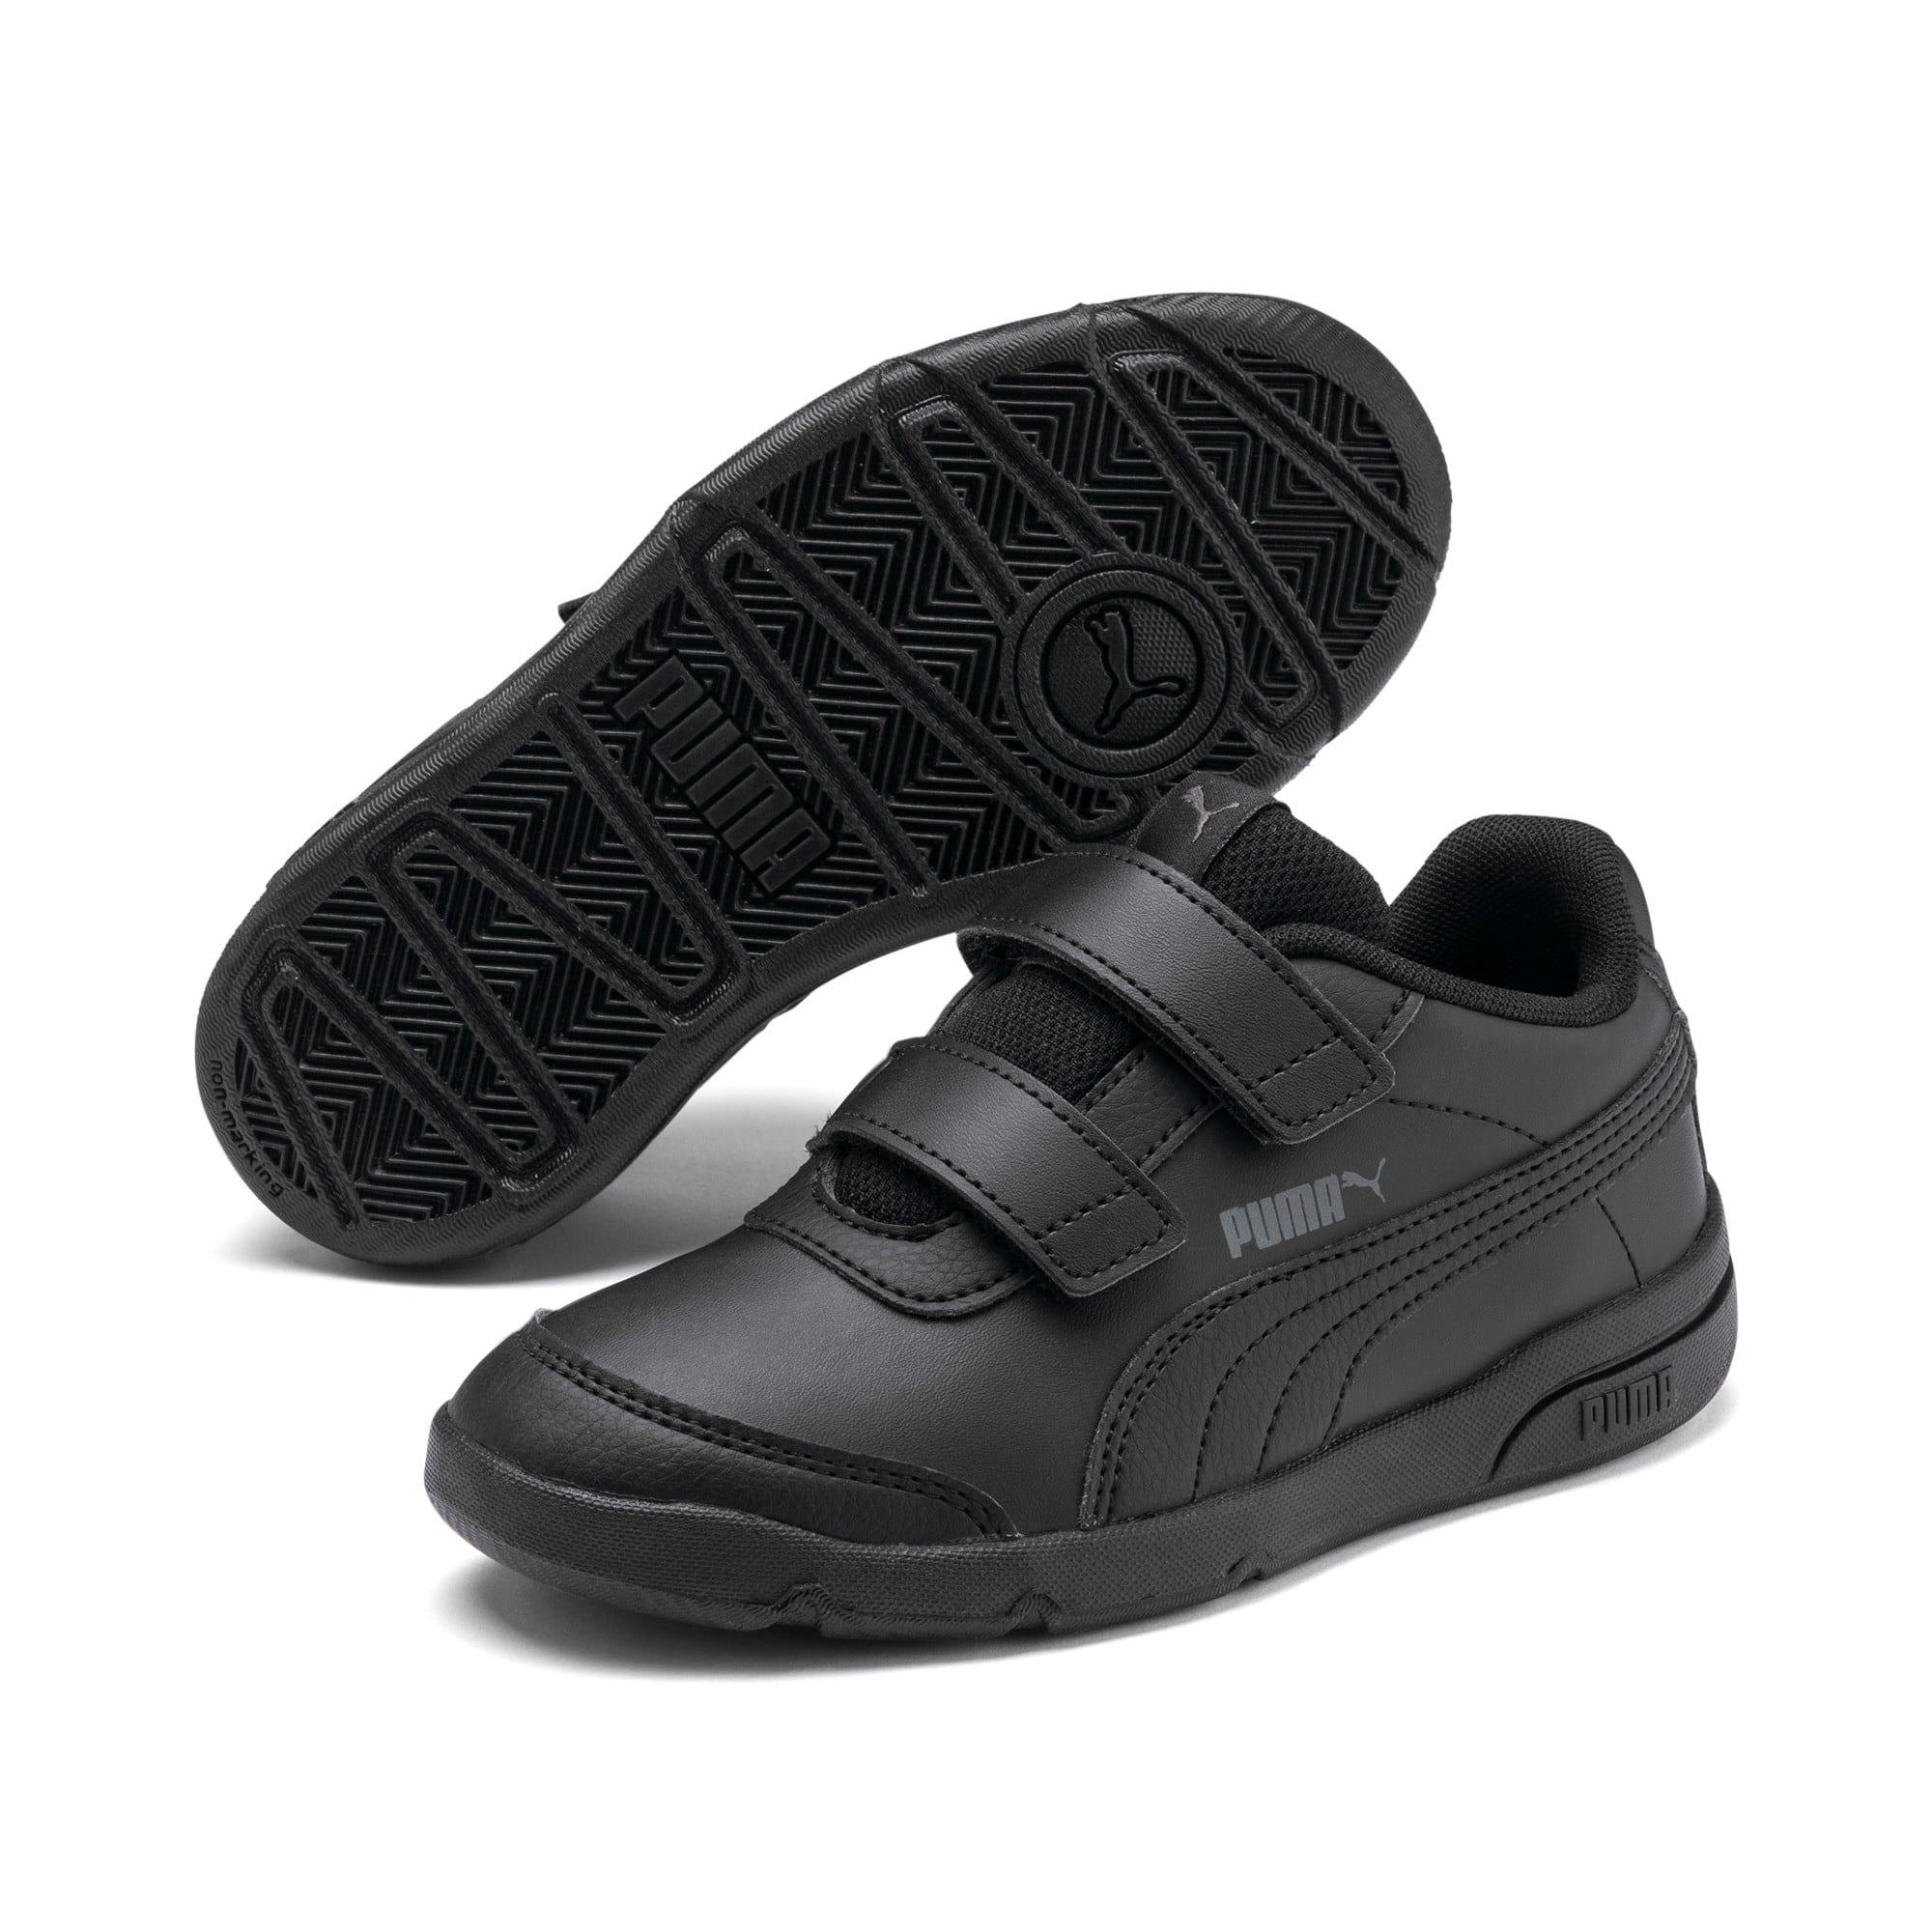 Thumbnail 2 of Stepfleex 2 SL VE V Kids' Trainers, Puma Black-Puma Black, medium